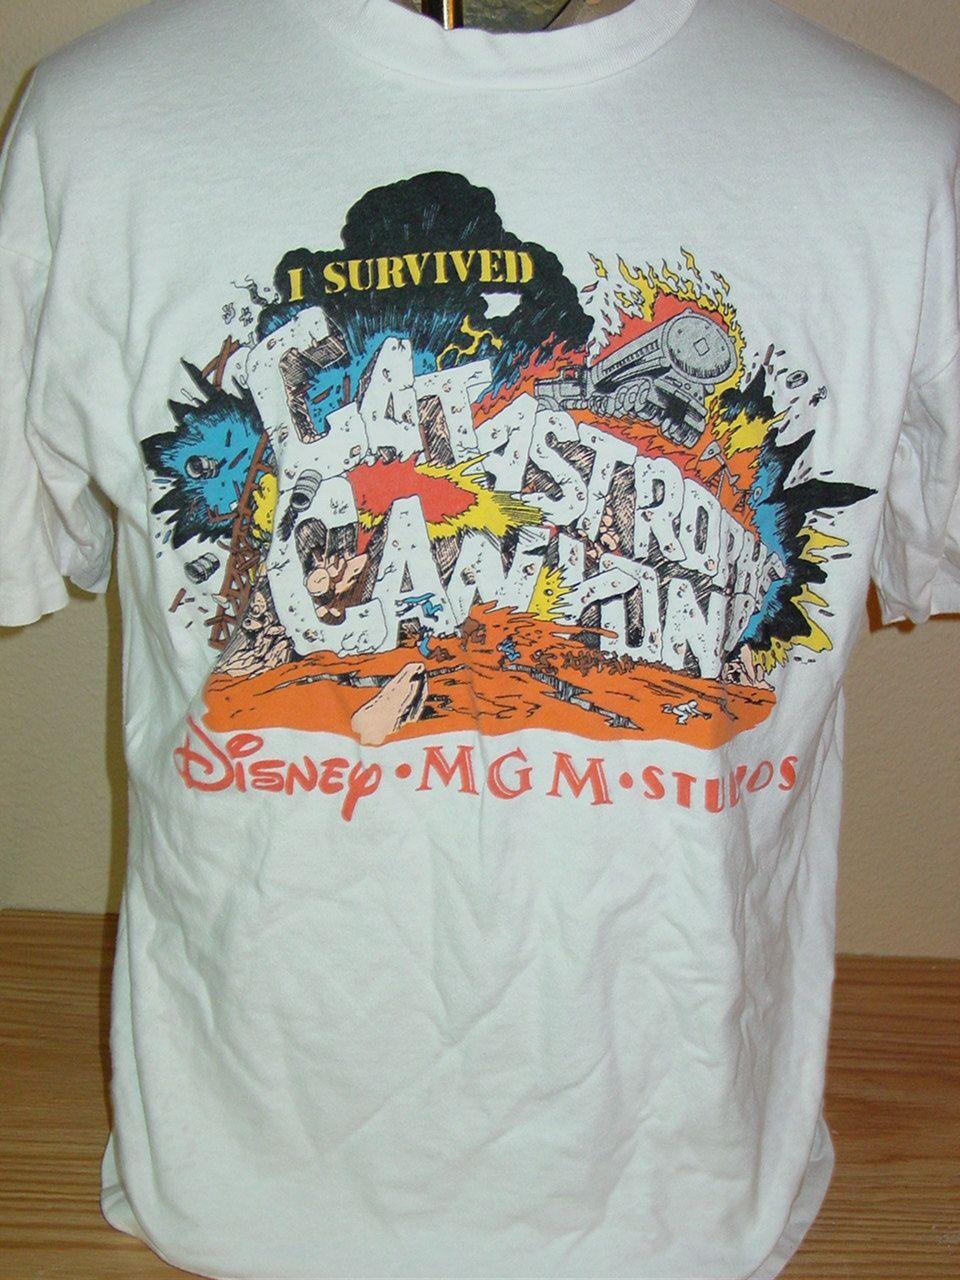 Vintage disney mgm studios extreme stunt show tshirt